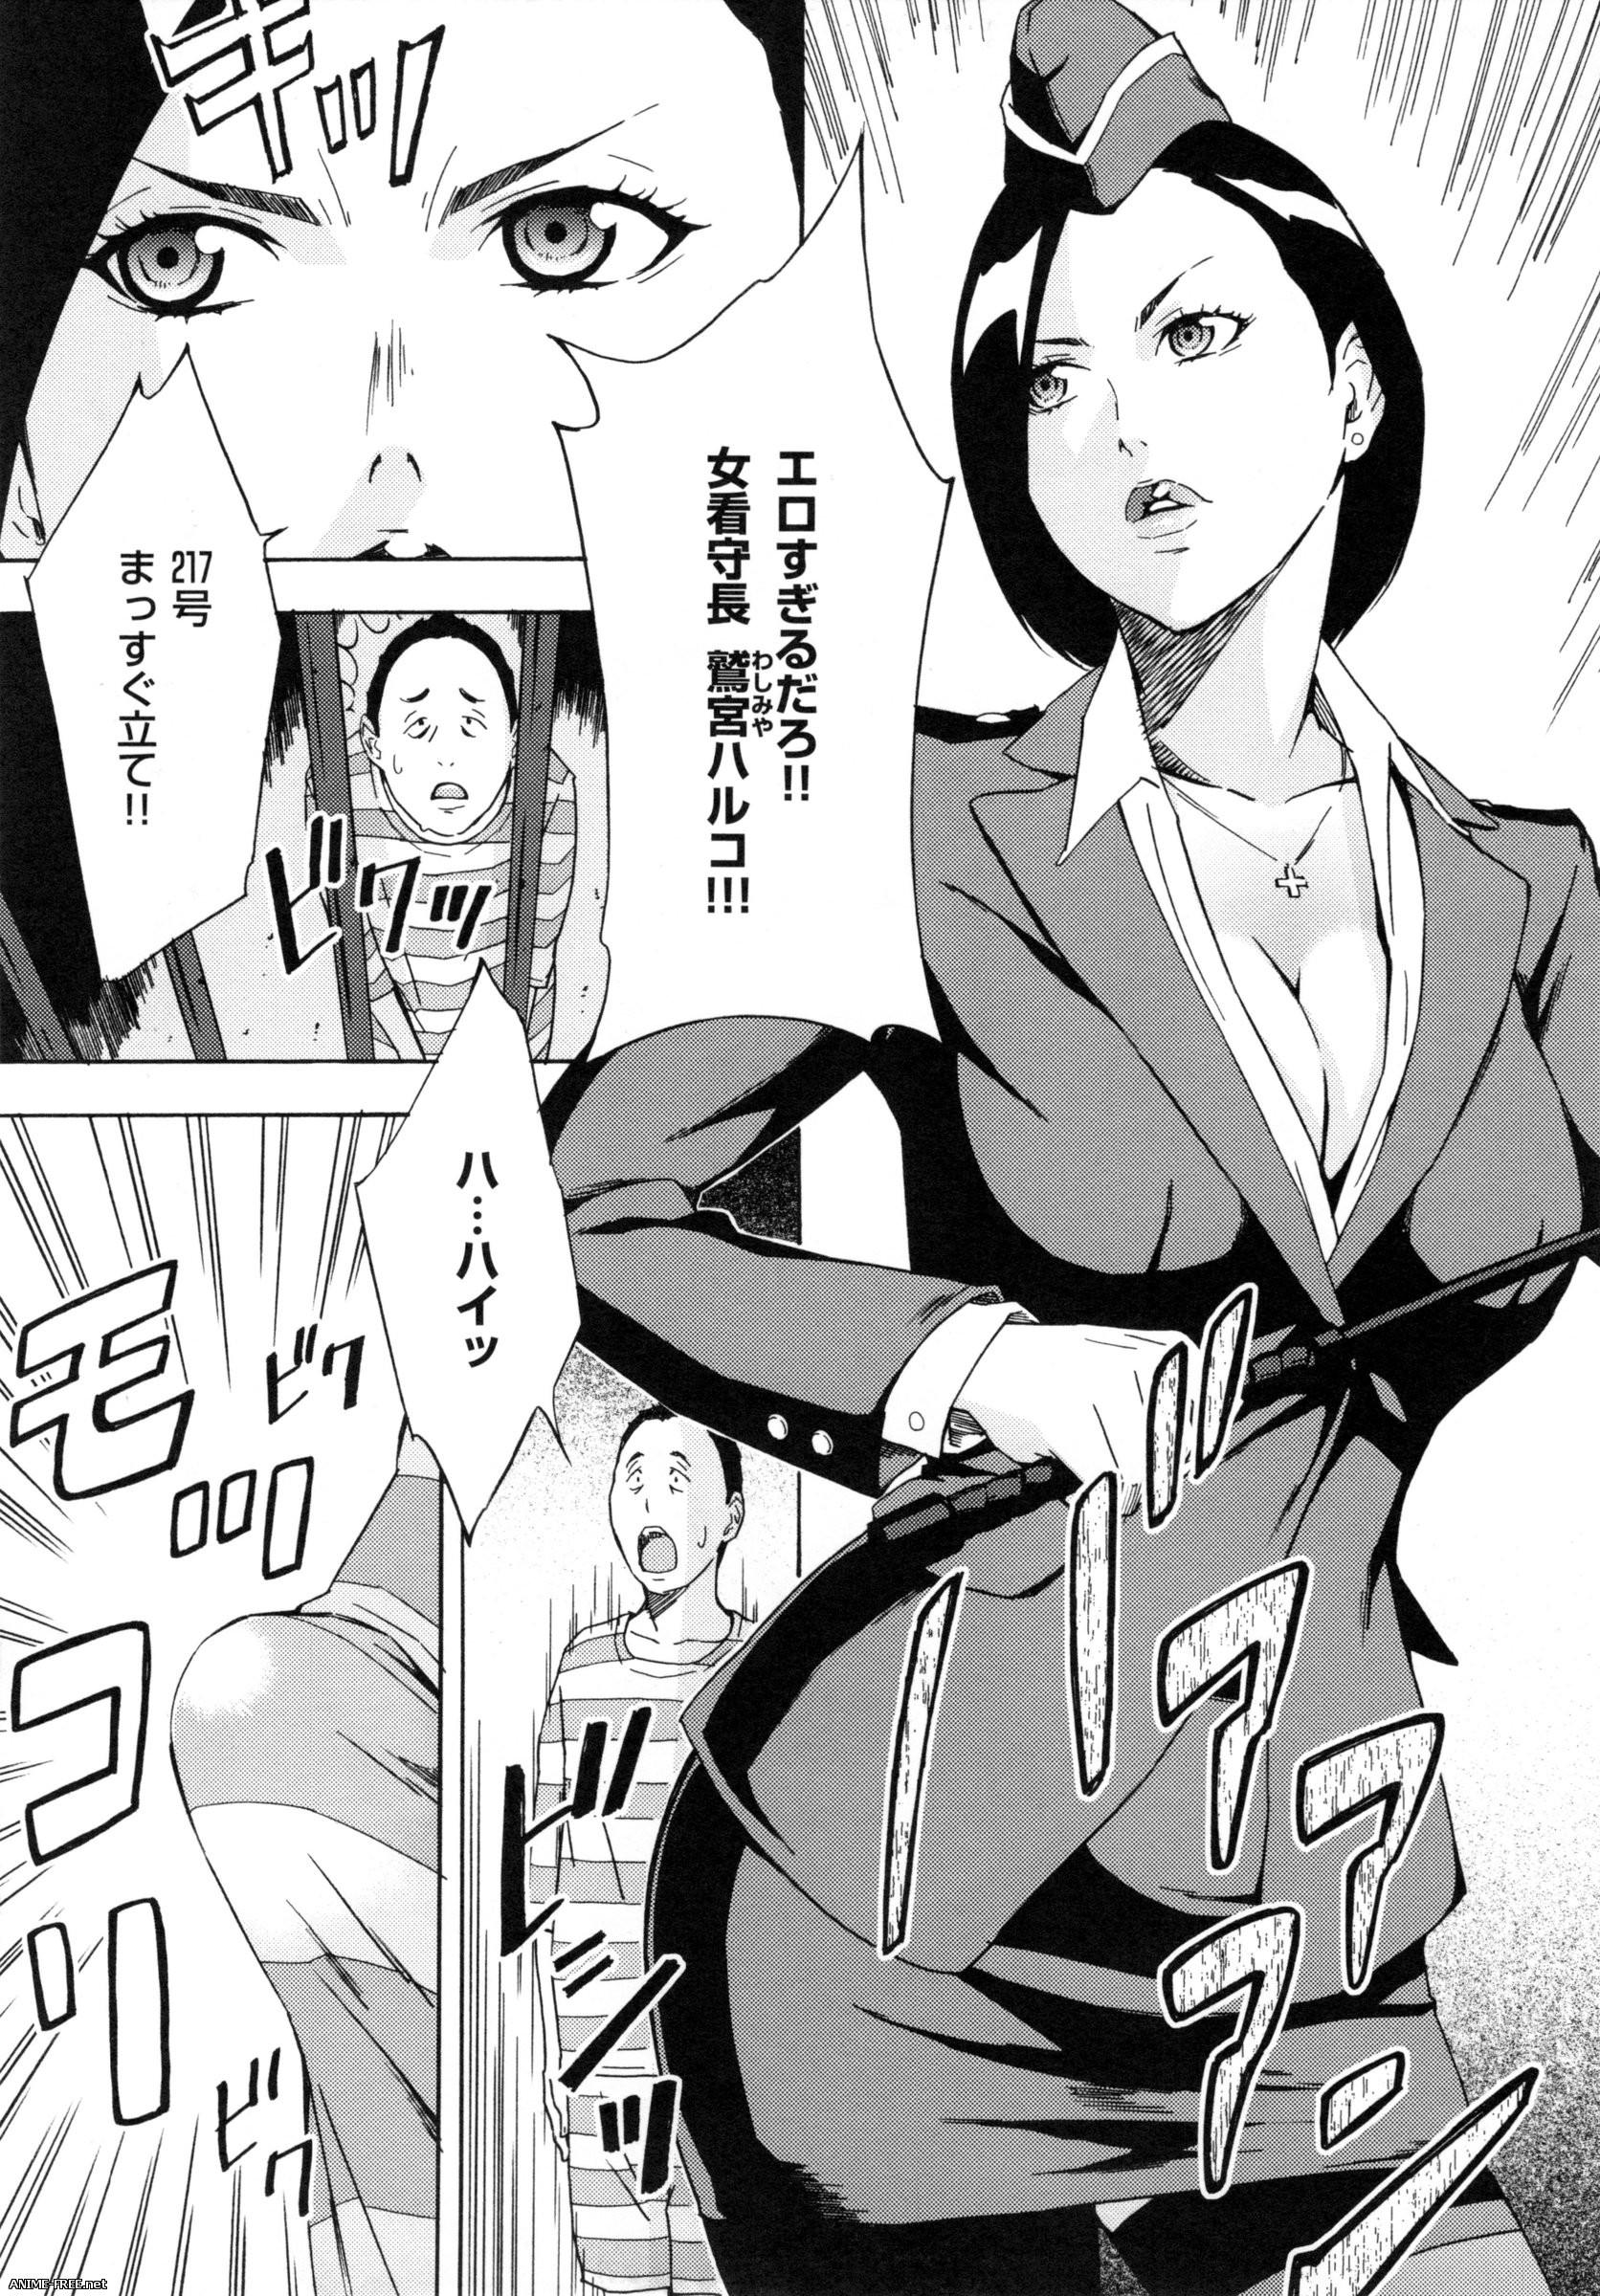 Amano Ameno (Collection) - Сборник хентай манги [Ptcen] [JAP,RUS,ENG] Manga Hentai